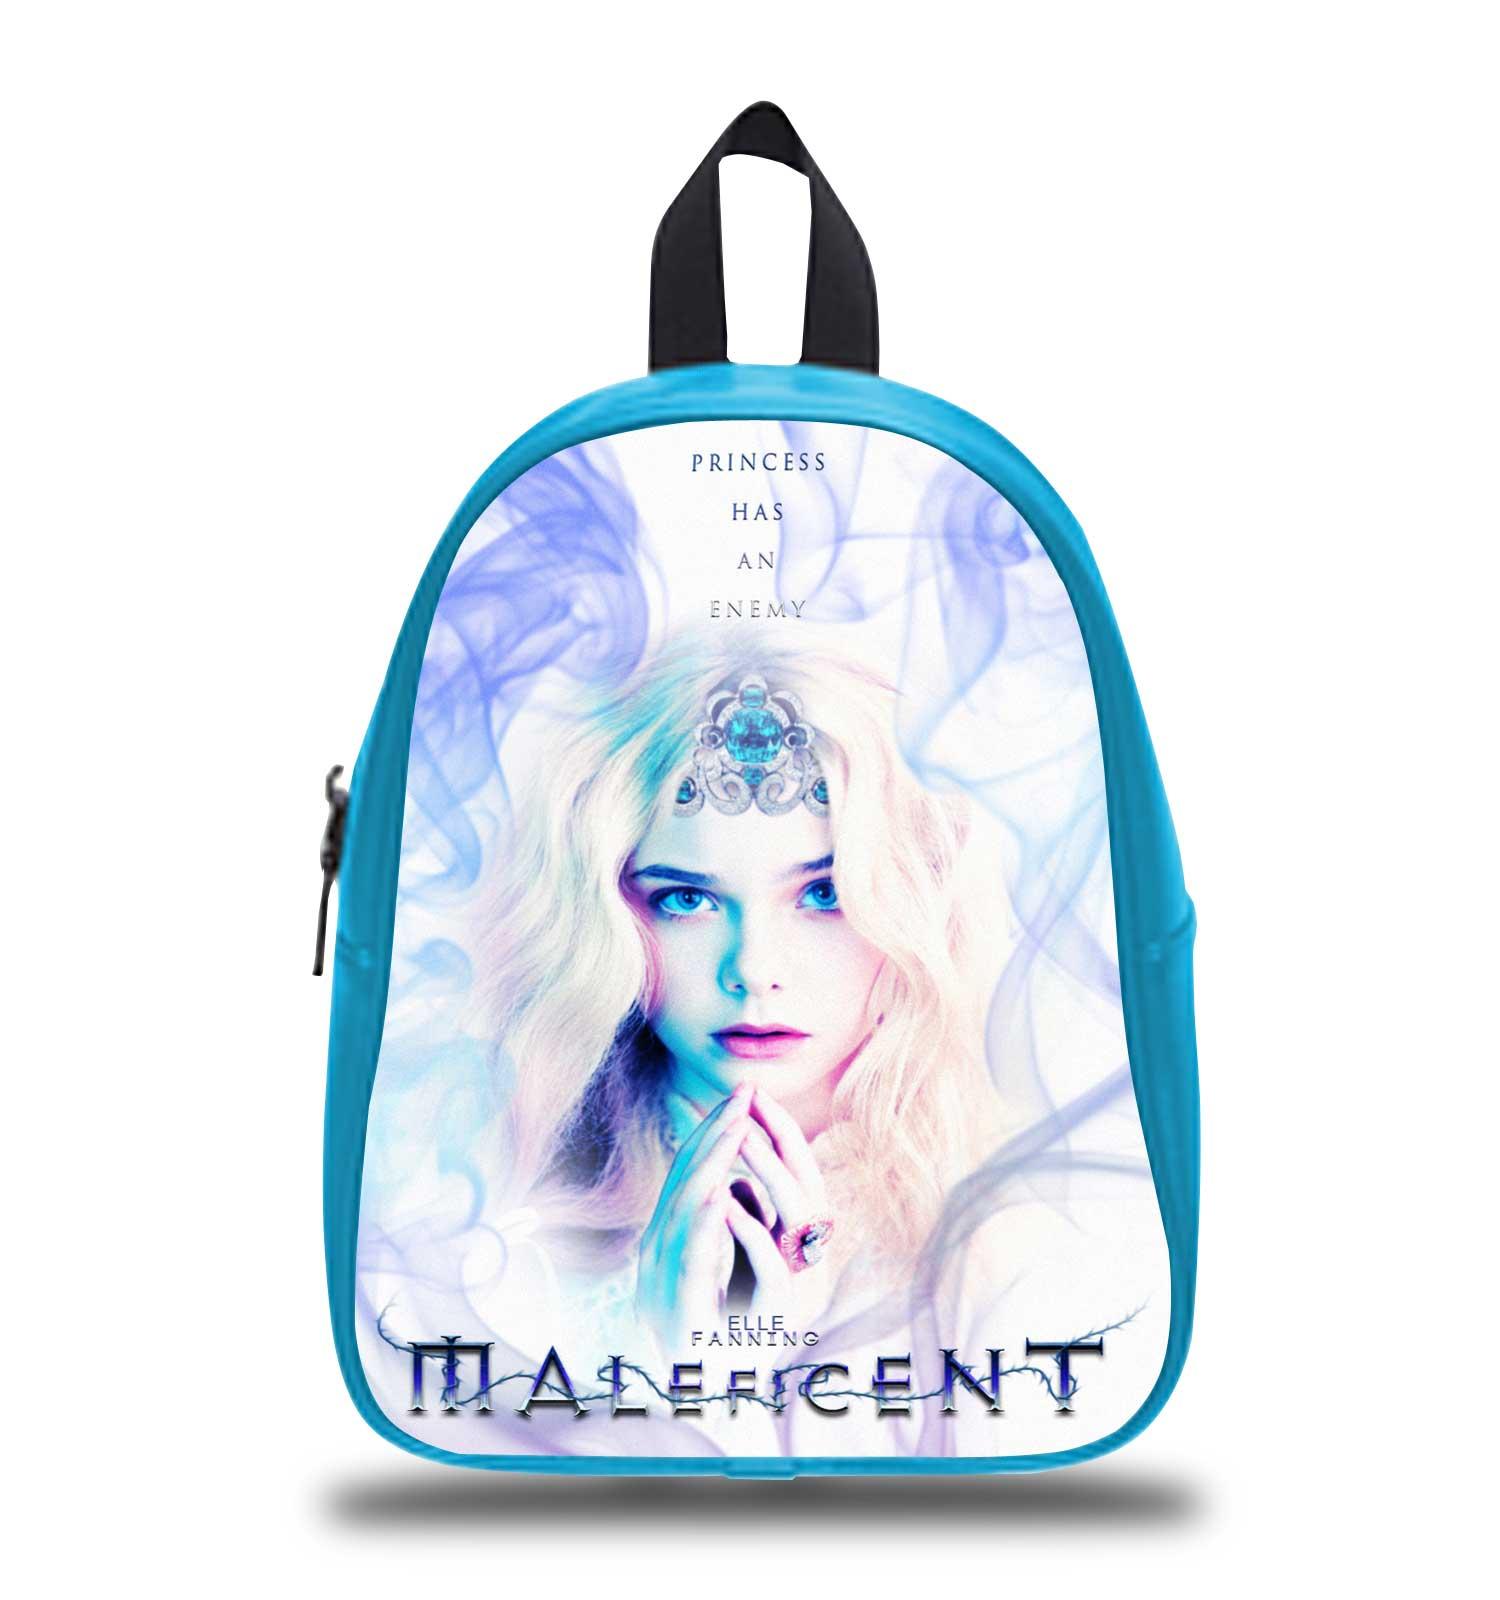 Maleficent Disney Princess Aurora Schoolbag Backpack S M L Kids School Bag From Fushionshop